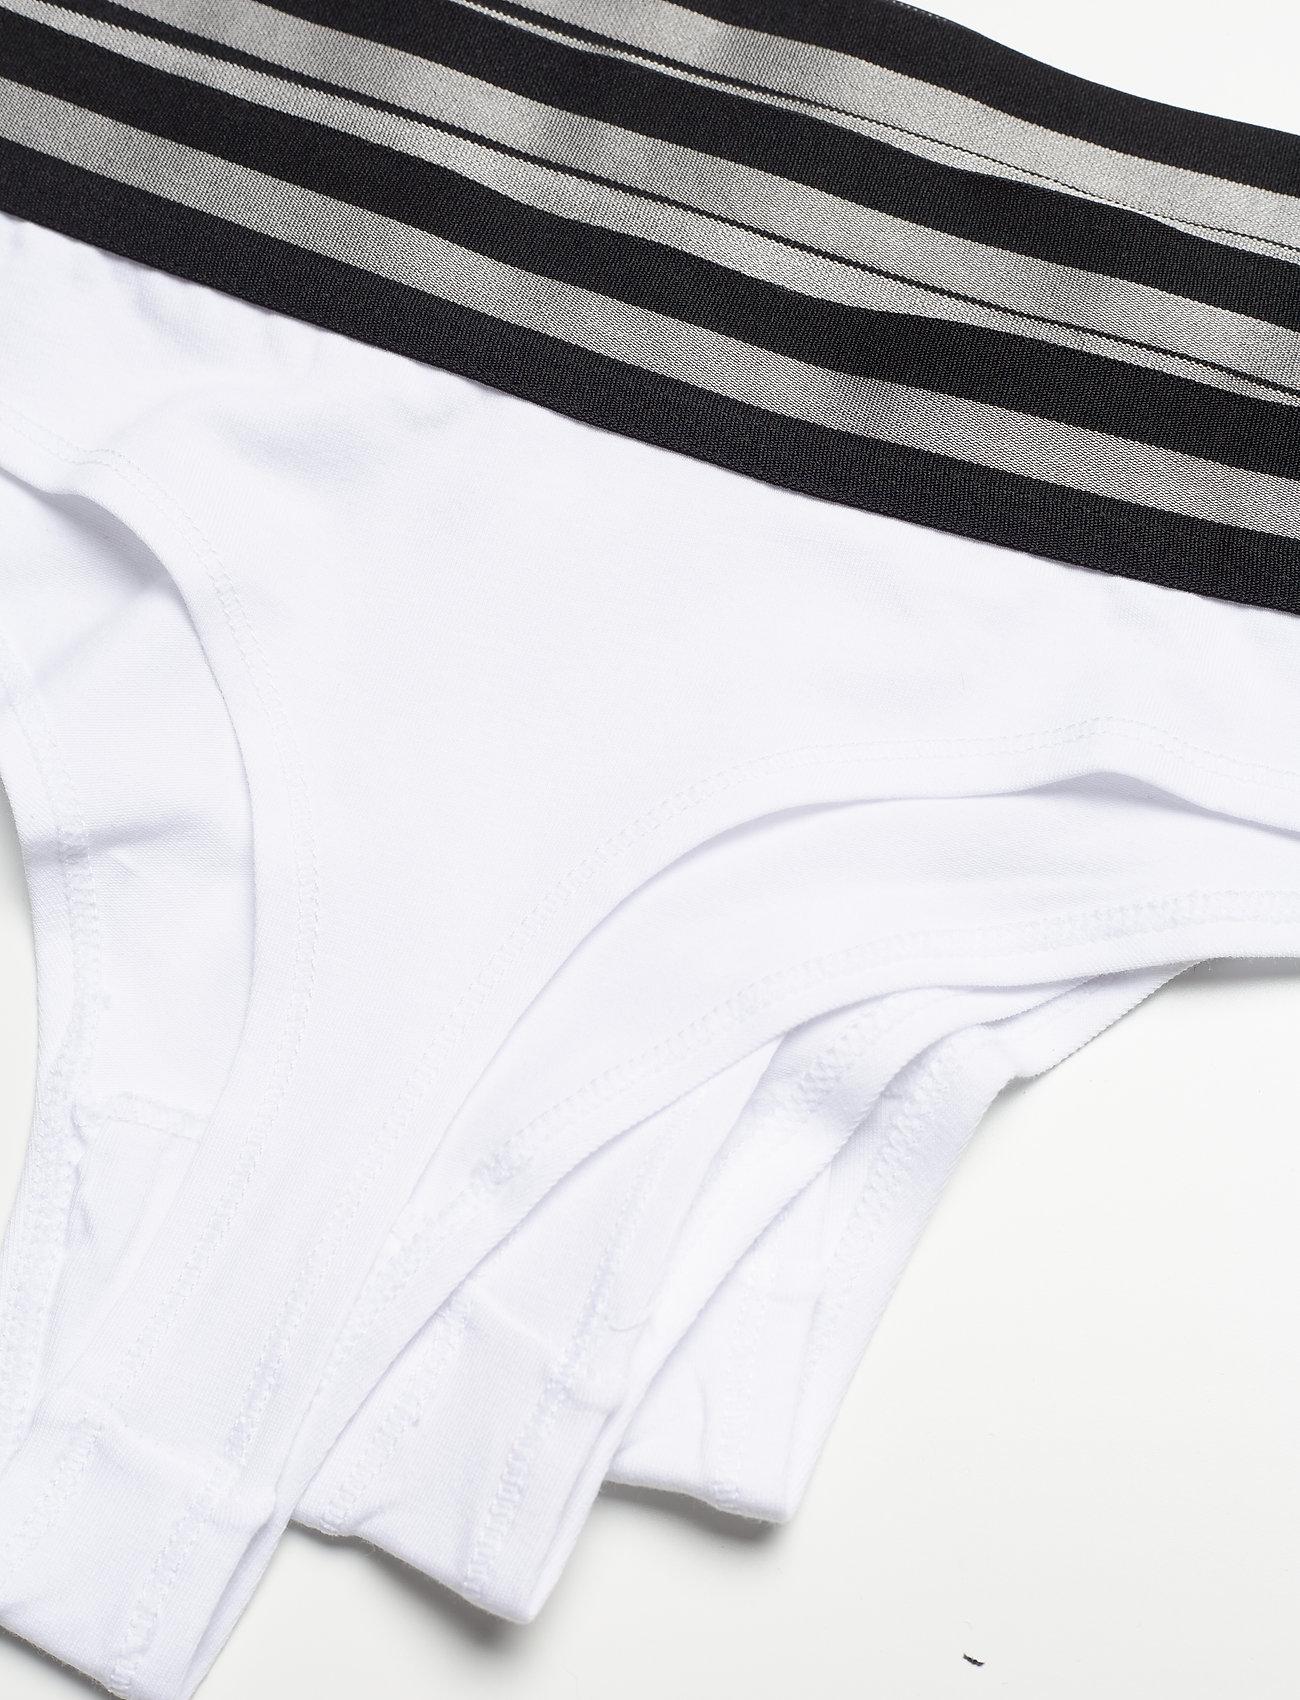 Danish Endurance - Organic Cotton Thong by Pernille Blume 3 Pack - slips - white - 1